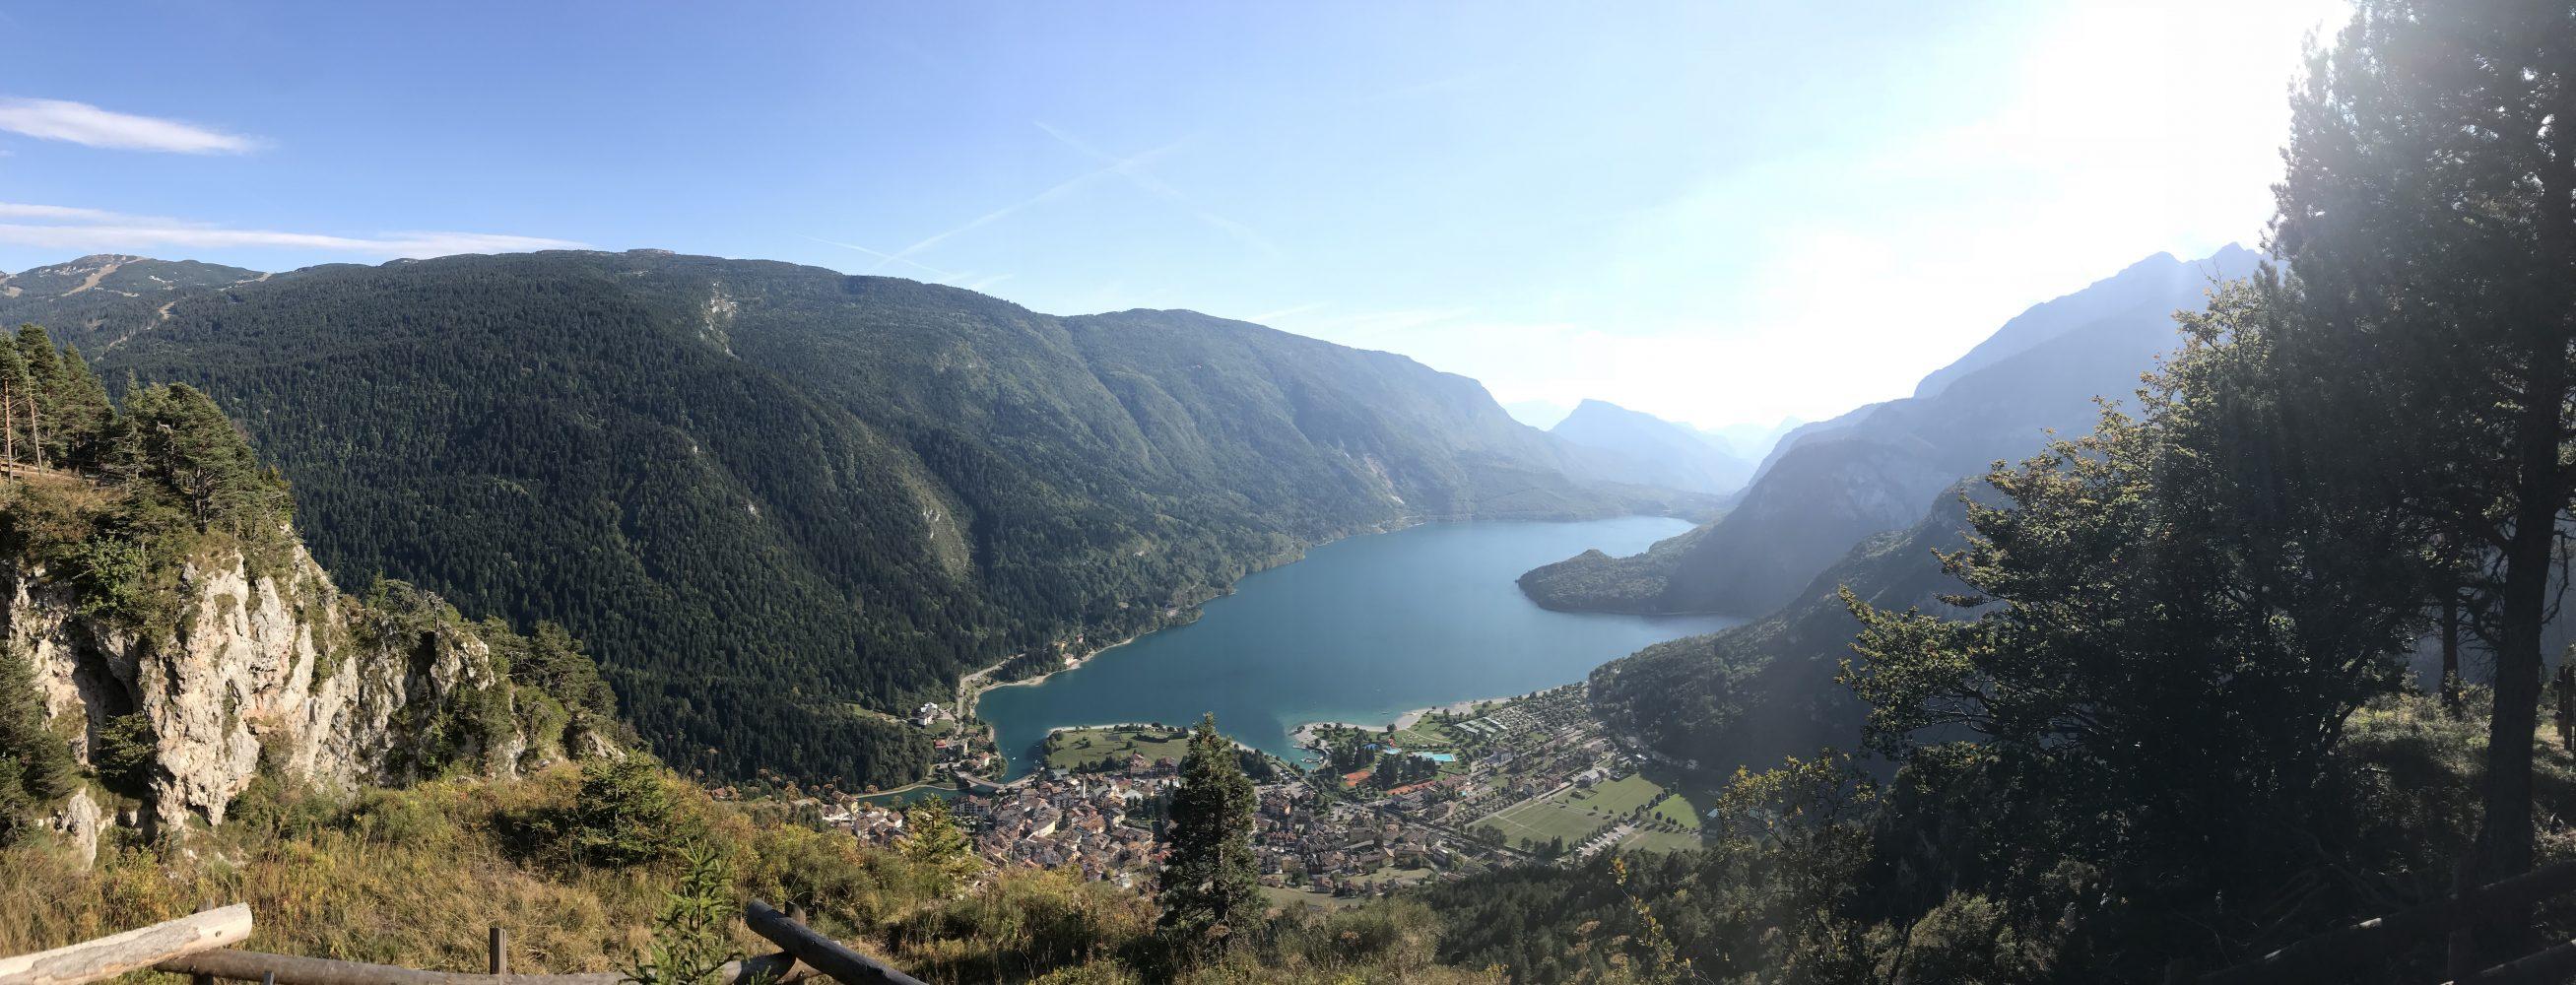 Panorama_Lago_Molveno_5854